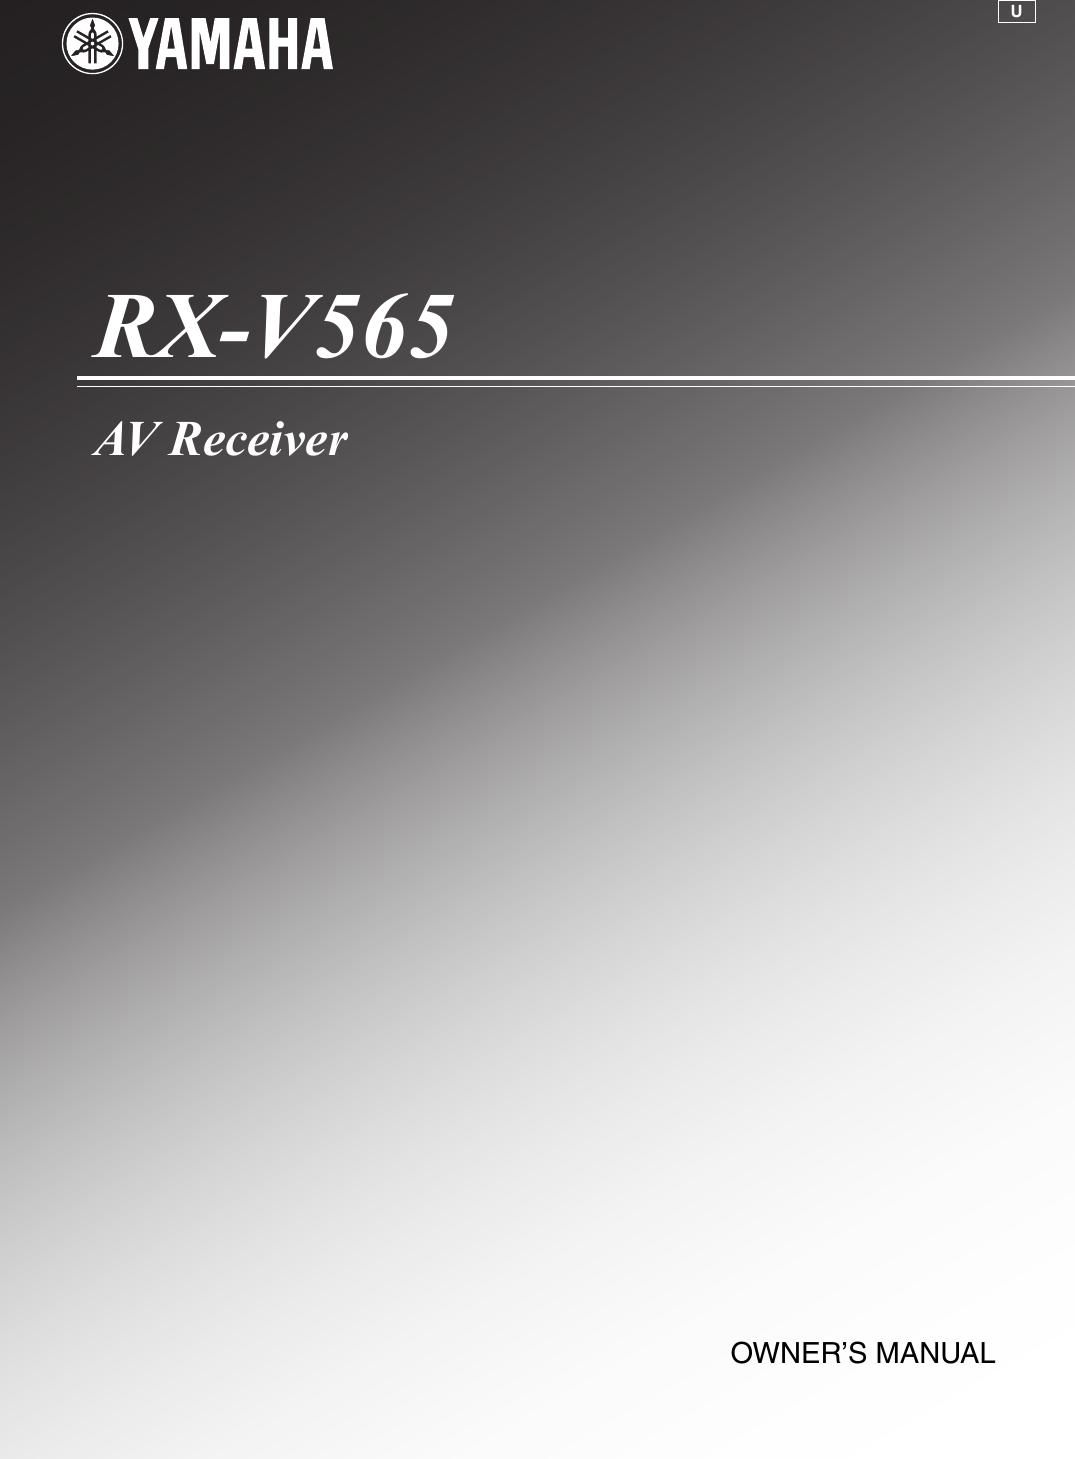 Onkyo Fr V5 Manual 19851995 Yamaha Moto4 200 225 250 350 Service Repair Array Rx V565 Owners Rh Usermanual Wiki